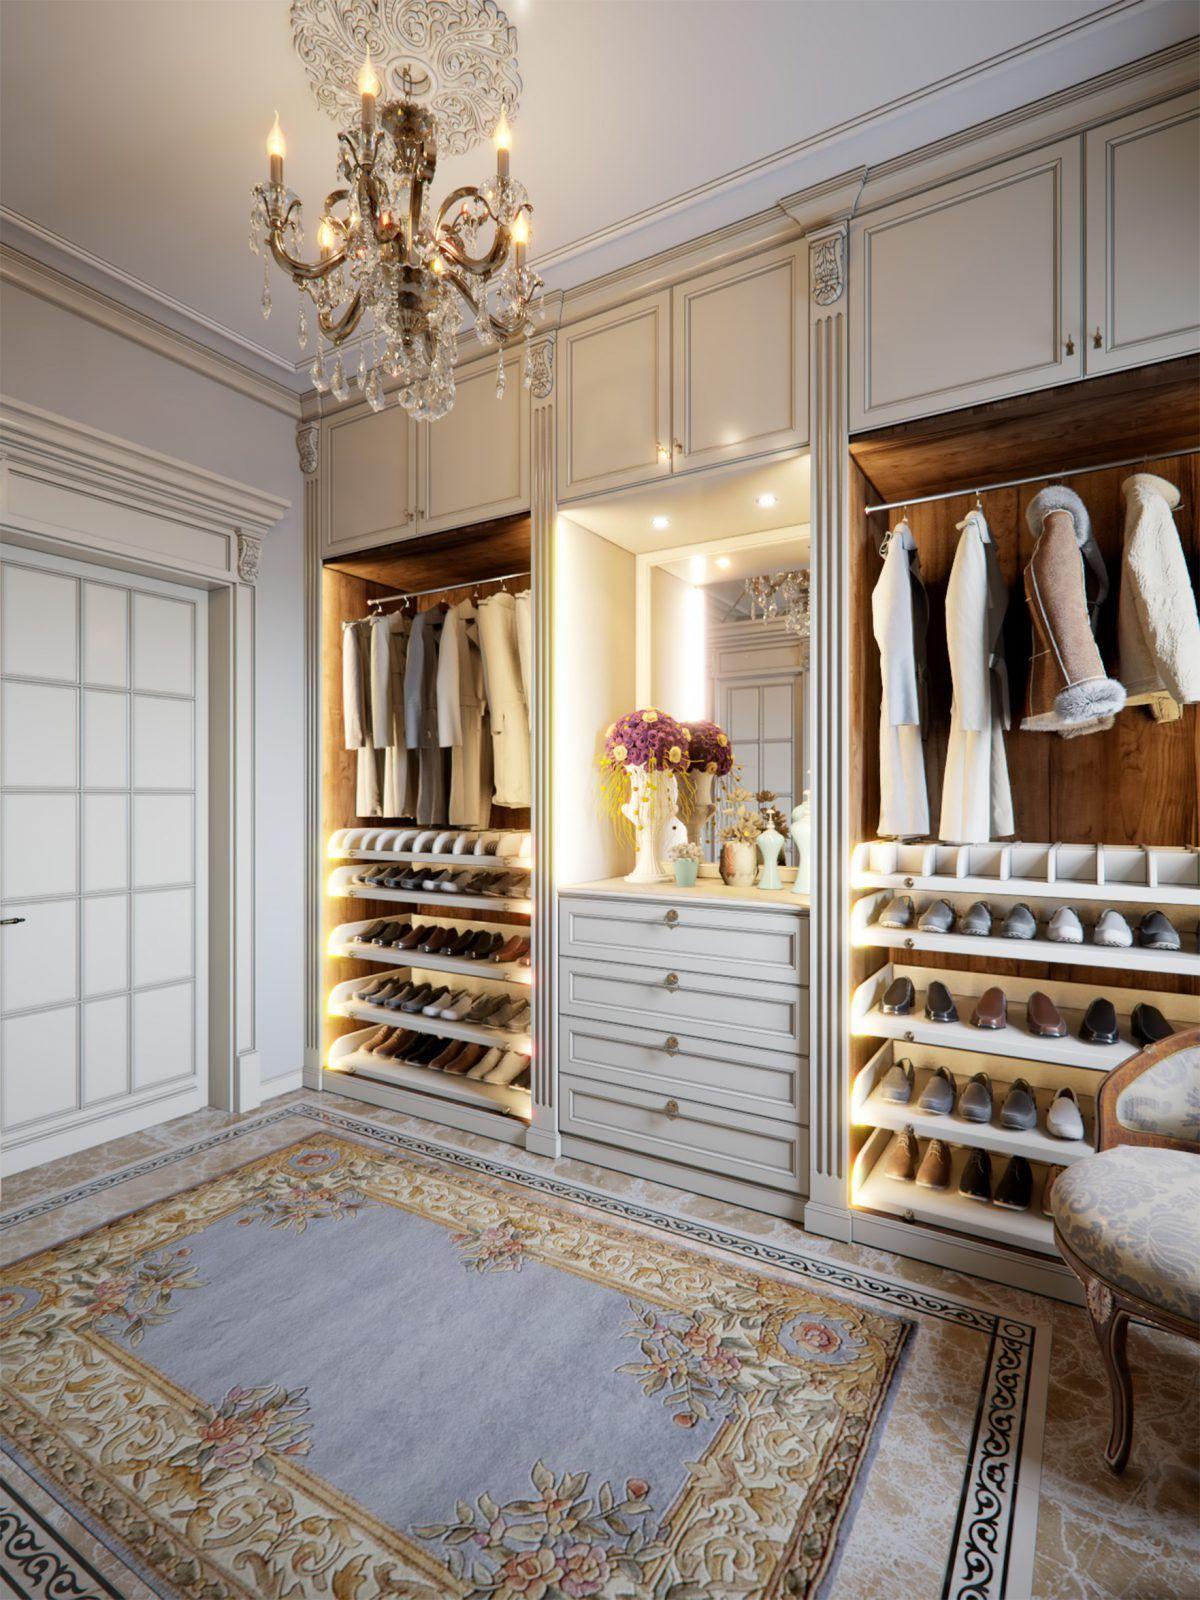 Different Closet Styles Closet Envy Dream Closet Design Wardrobe Room Closet Designs